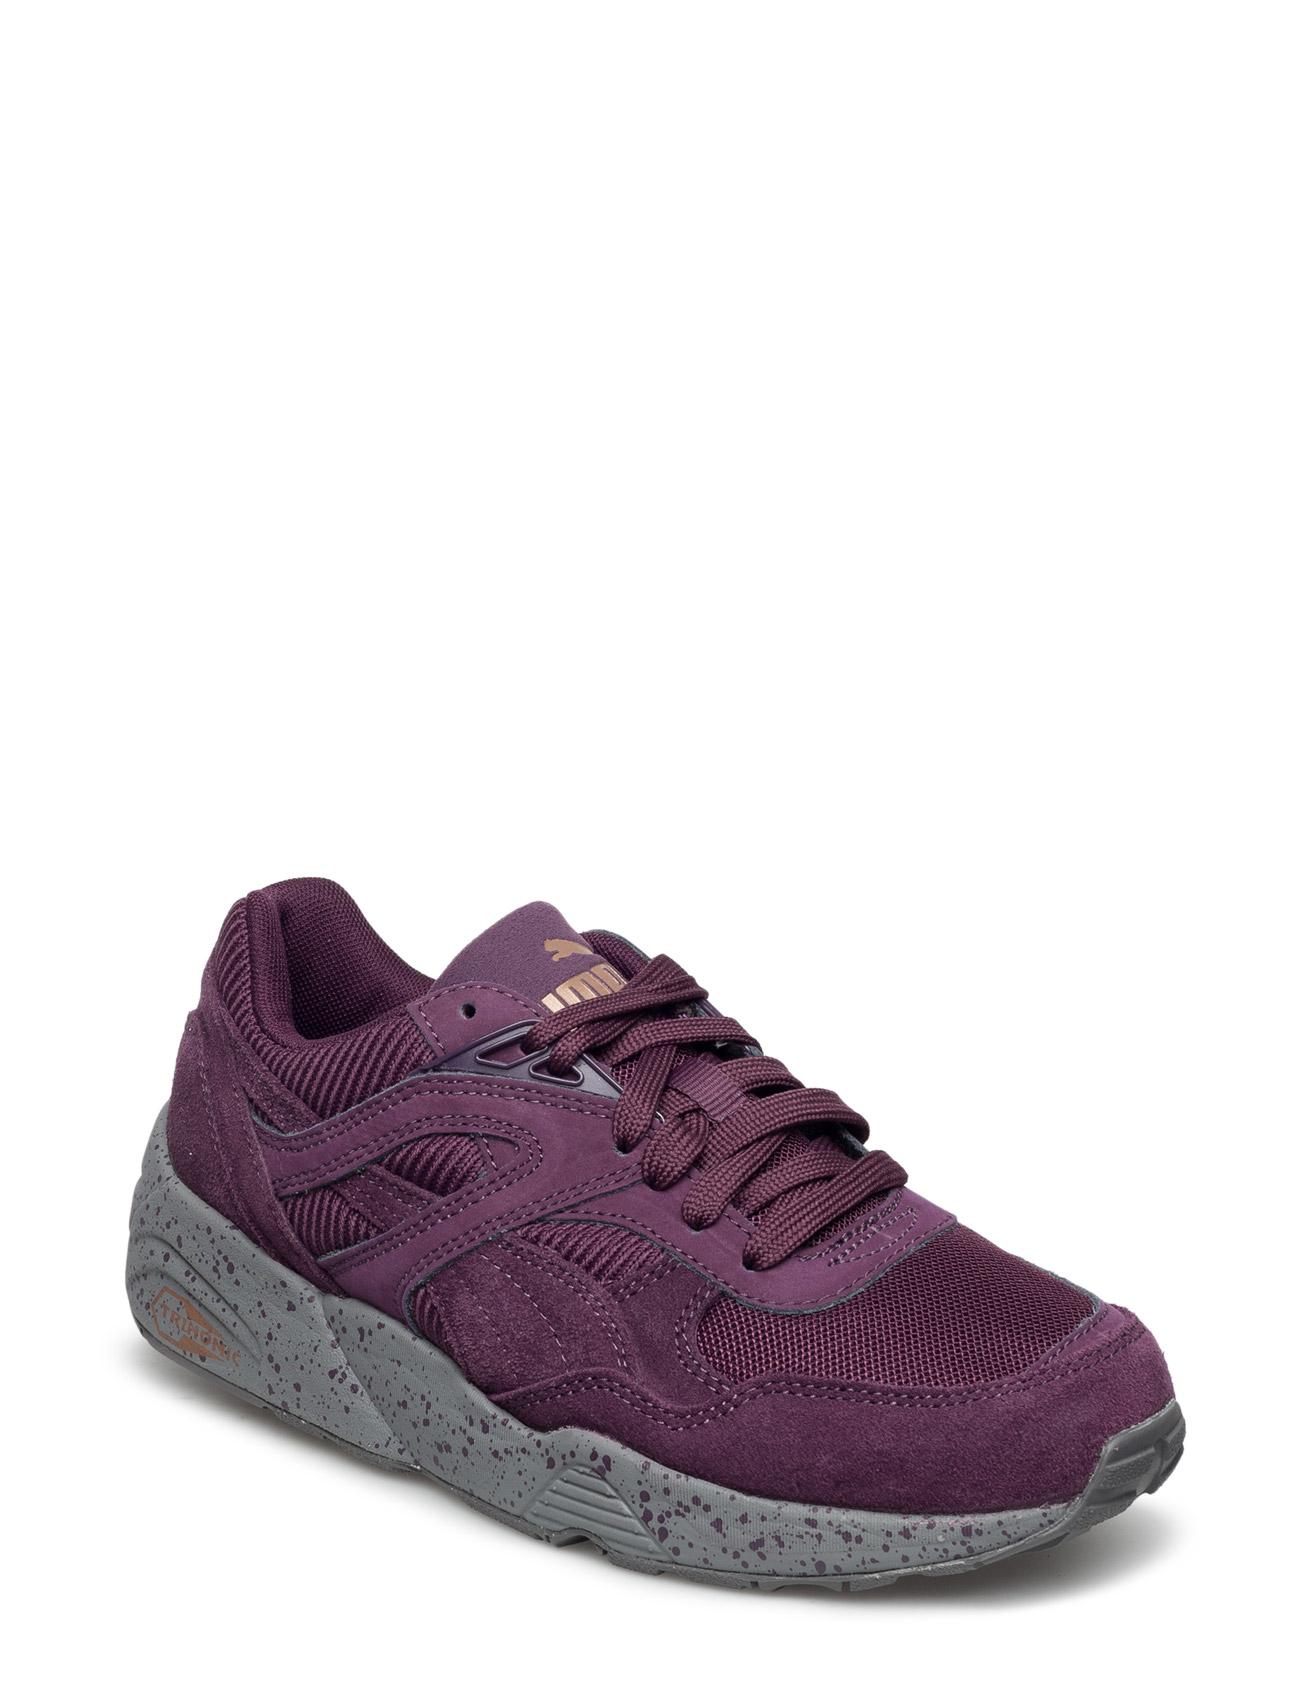 R698 Winterized Wn'S Puma Sneakers til Damer i